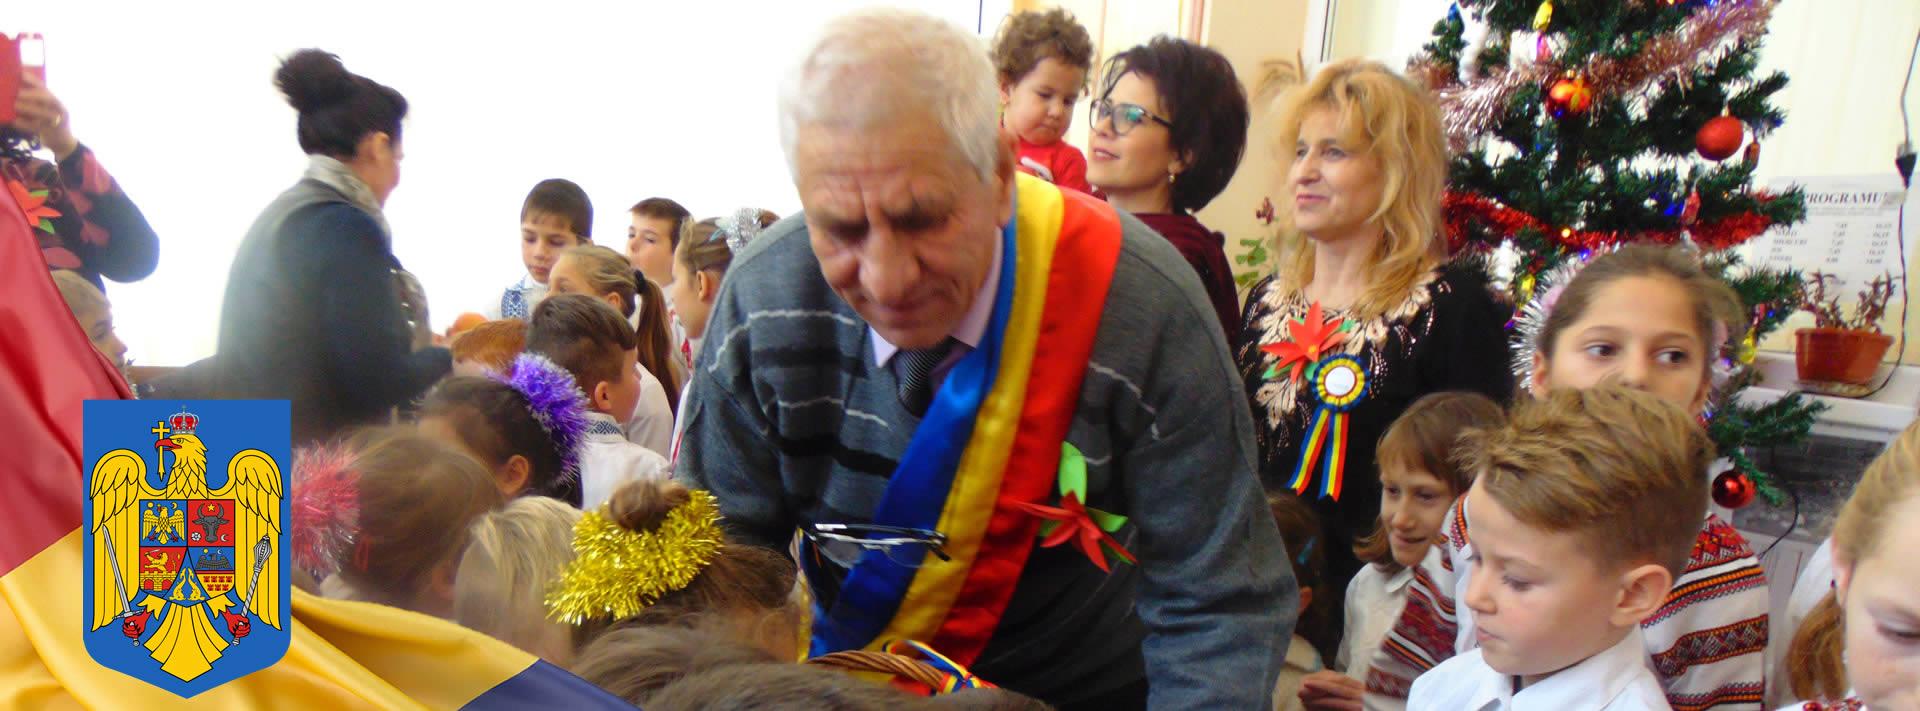 Primarul comunei Berești-Meria, printre copii